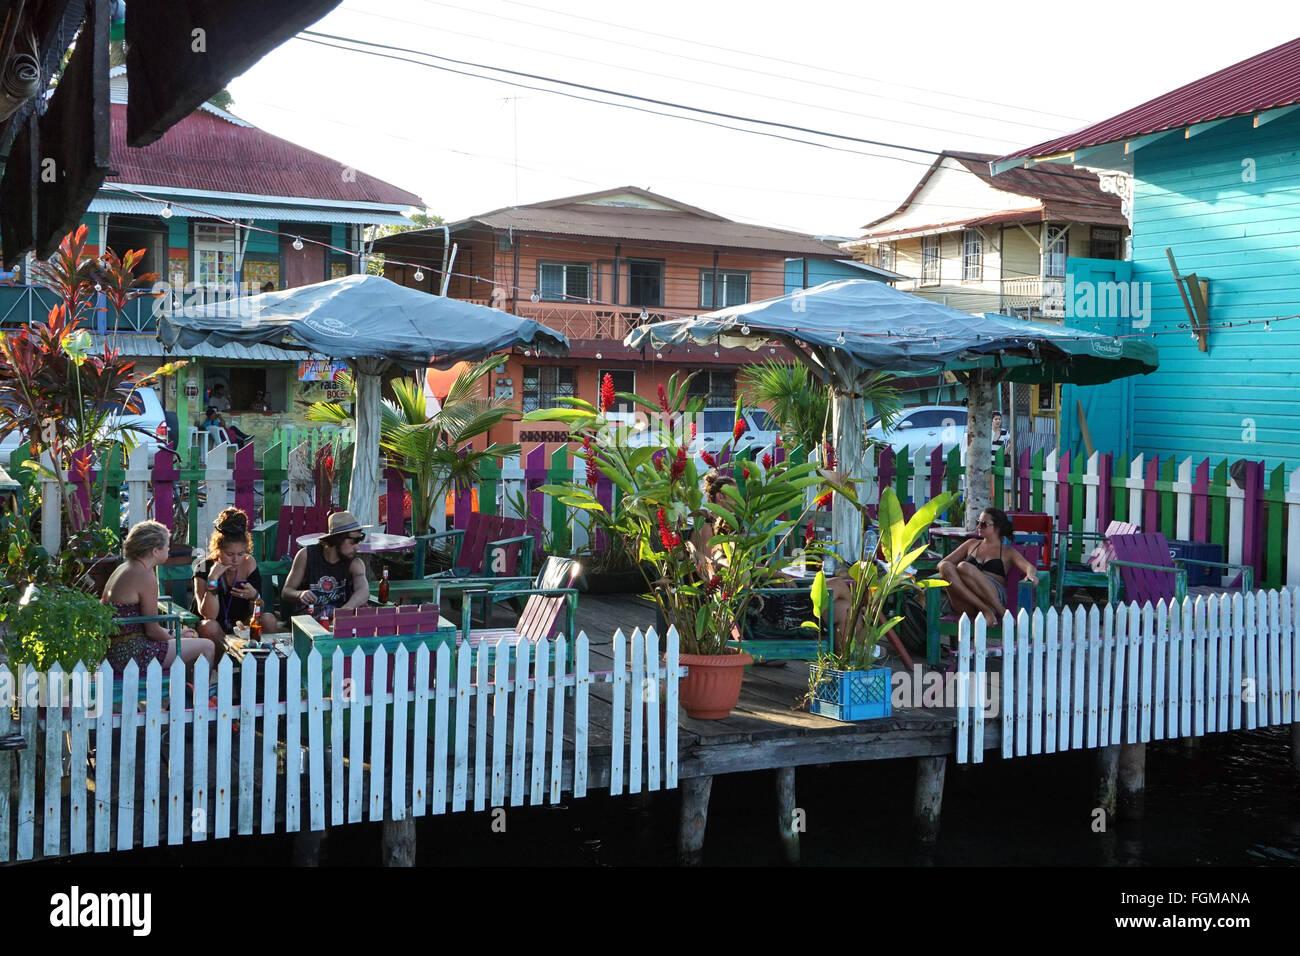 Lounge bar at Bocas town Isla Colon Bocas del Toro Panama - Stock Image